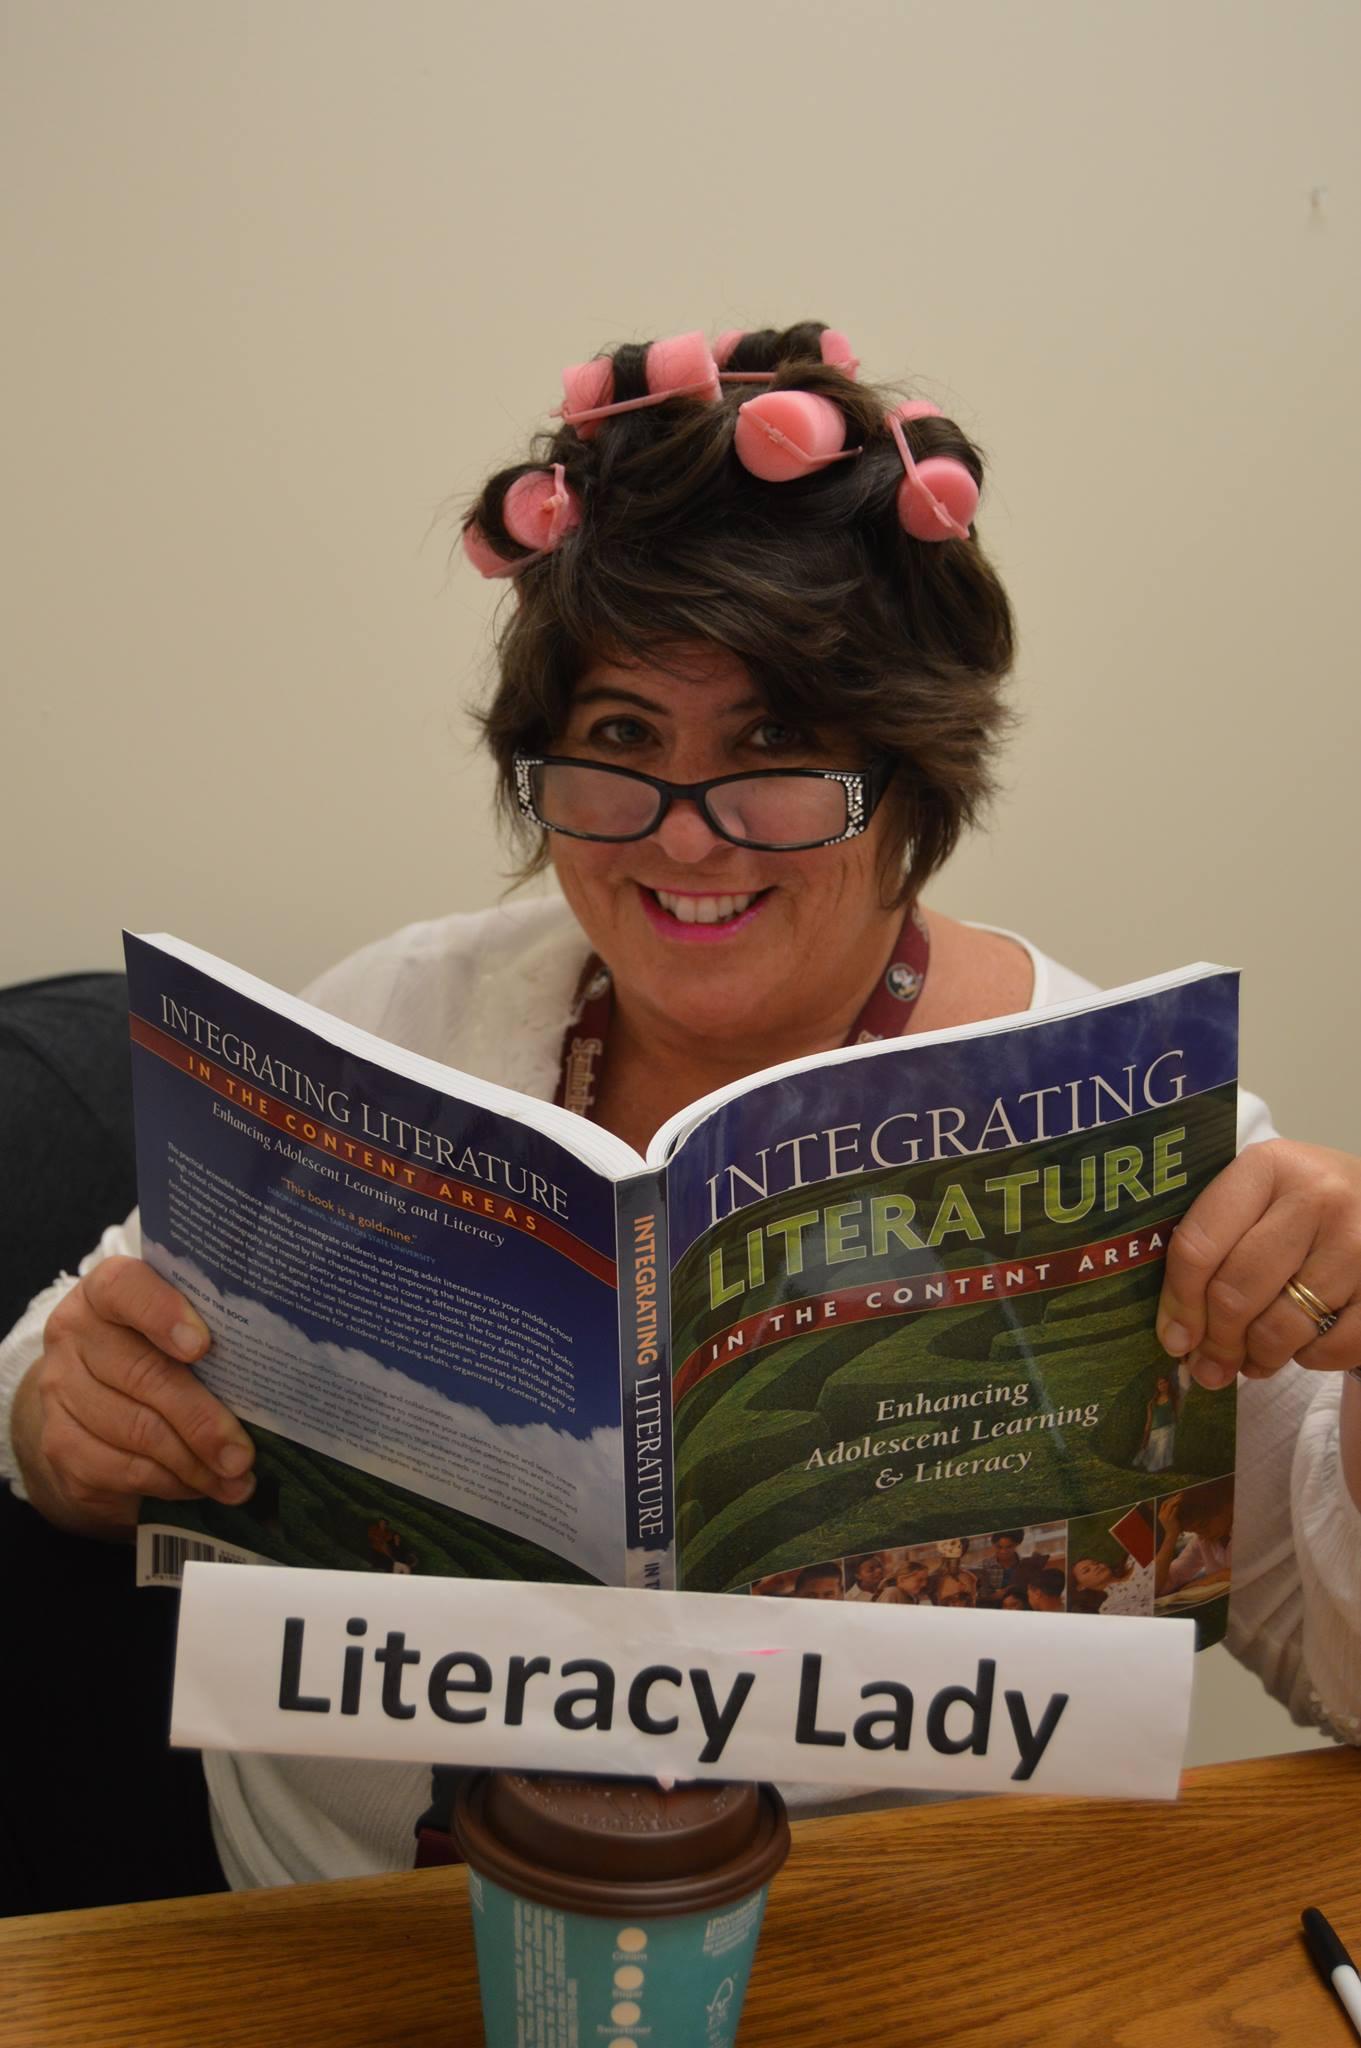 literacylady.jpg